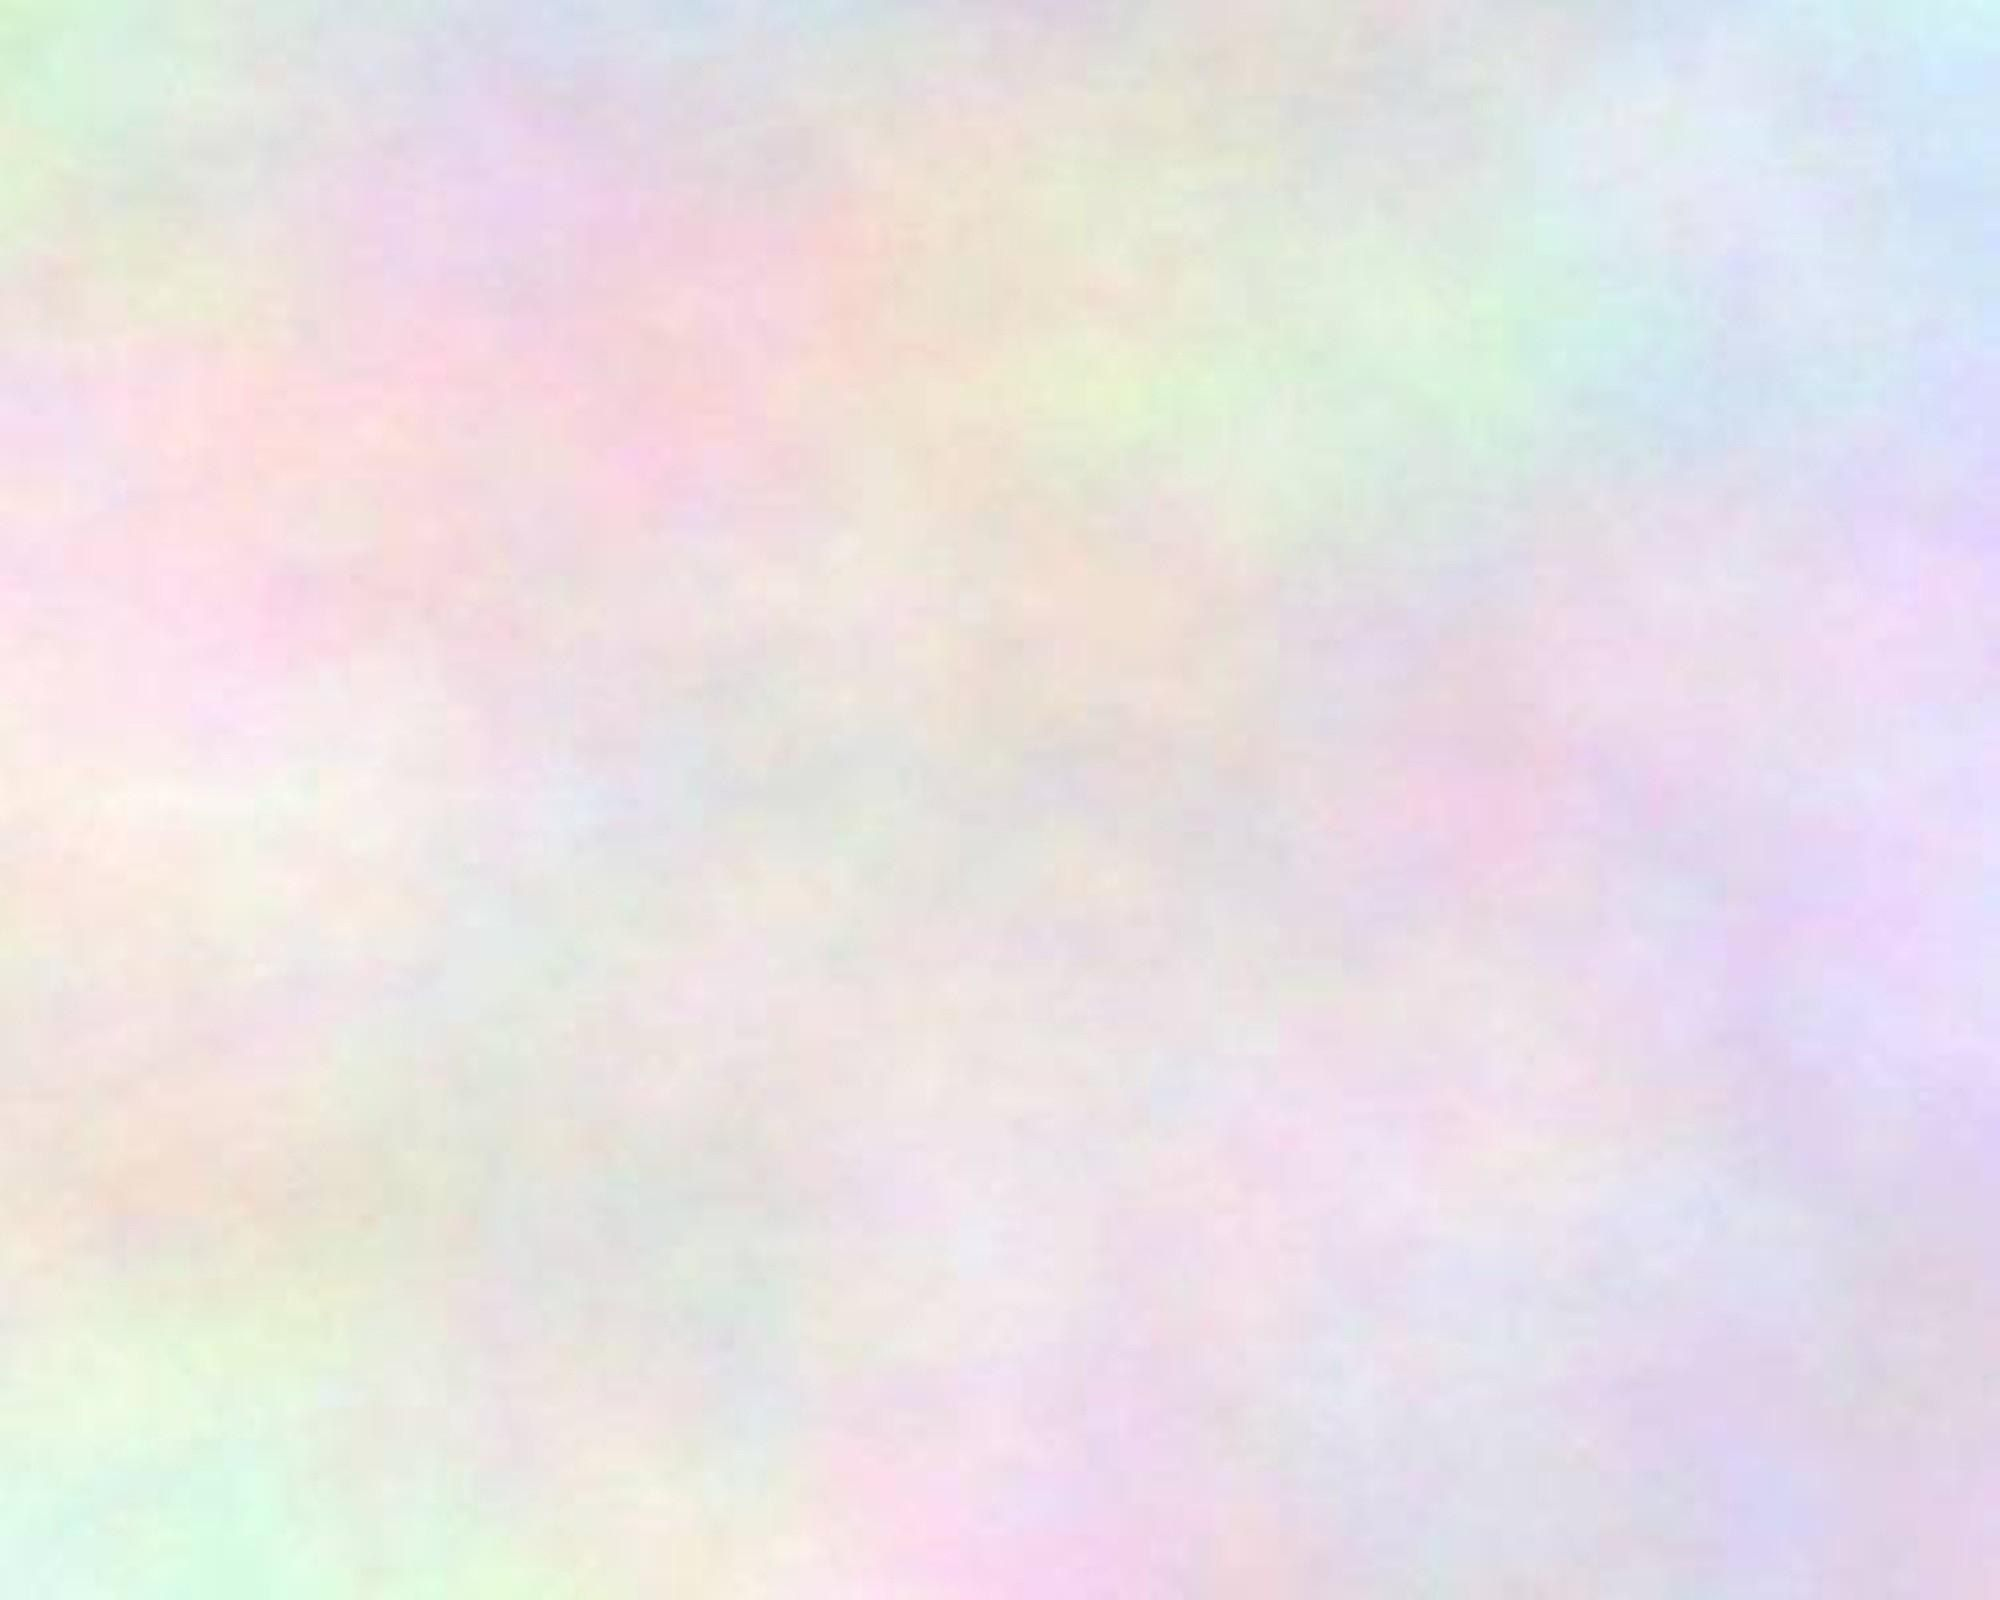 https://cdn.flow.page/images/c45f6f25-5d67-4d99-a064-40103fa0b6b4-background?m=1619158194